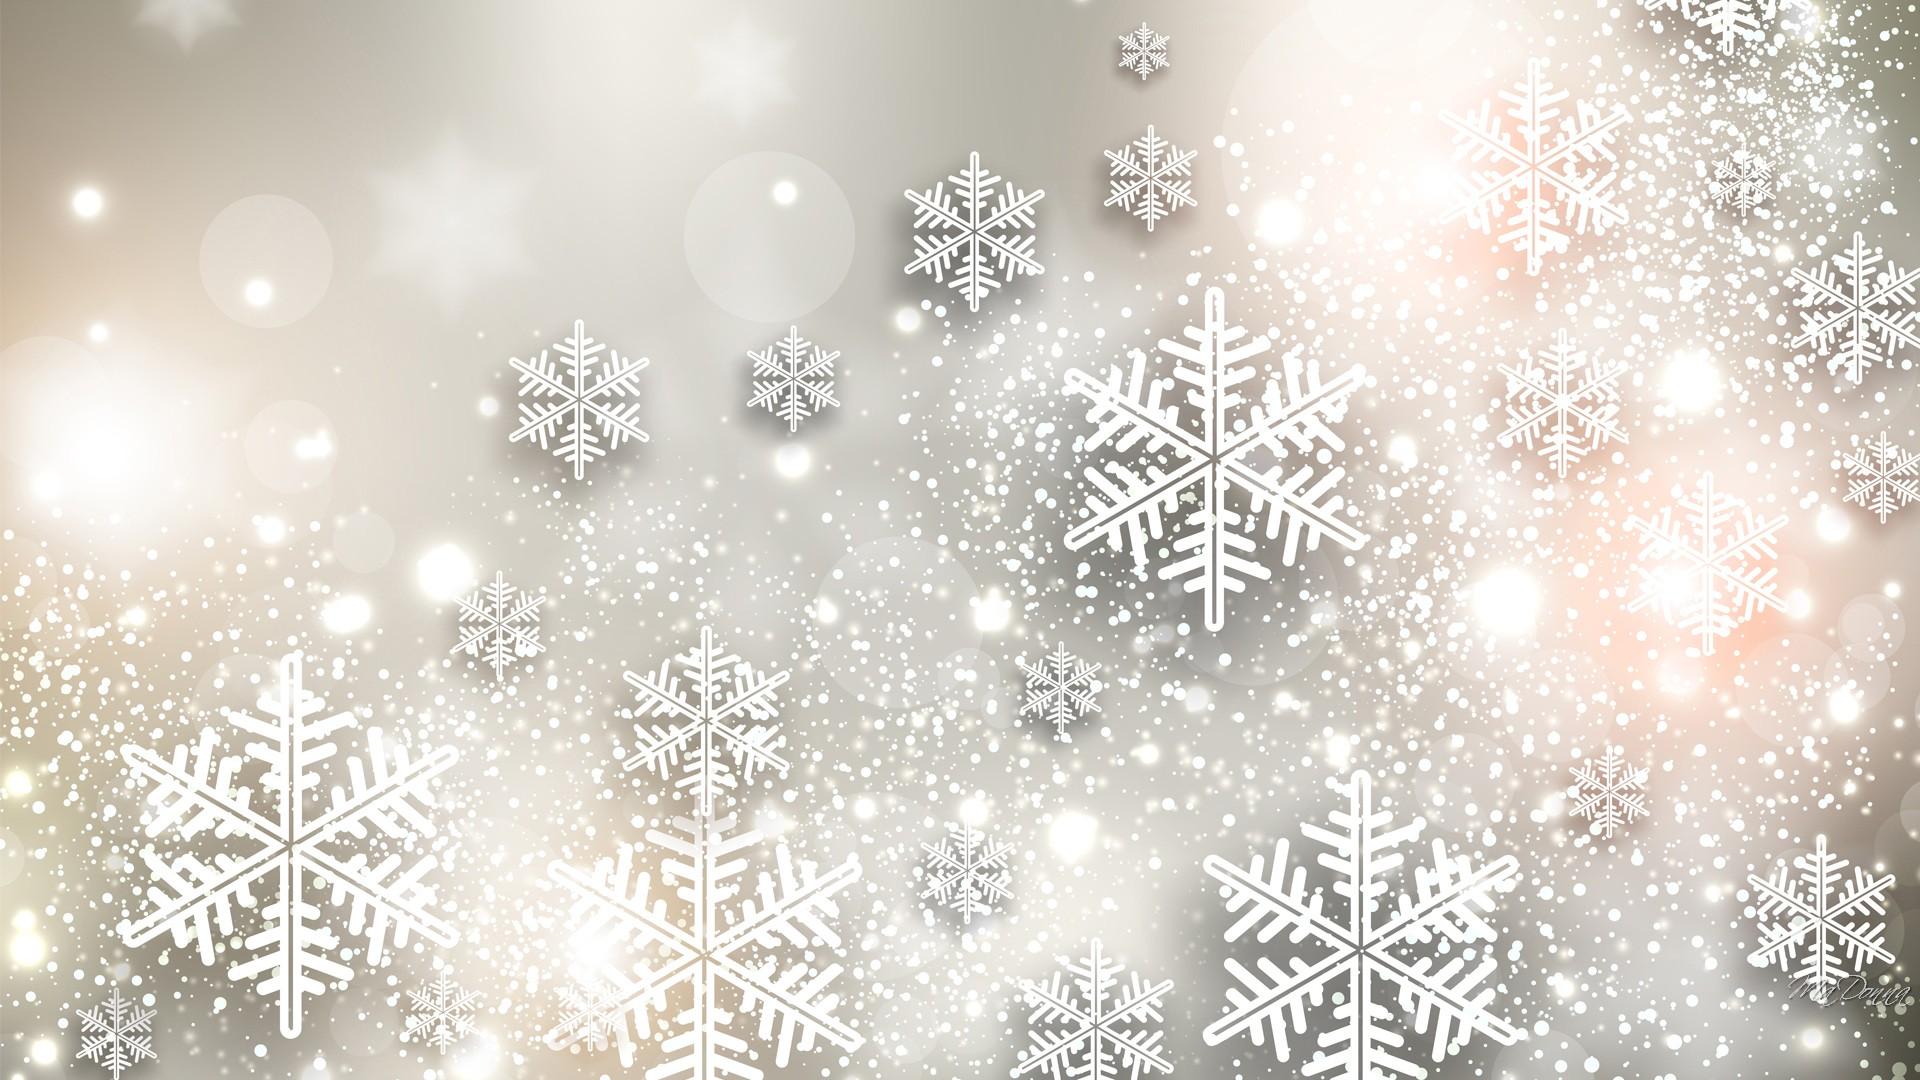 Falling Glitter Wallpaper Snowflakes Full Hd Bakgrund And Bakgrund 1920x1080 Id